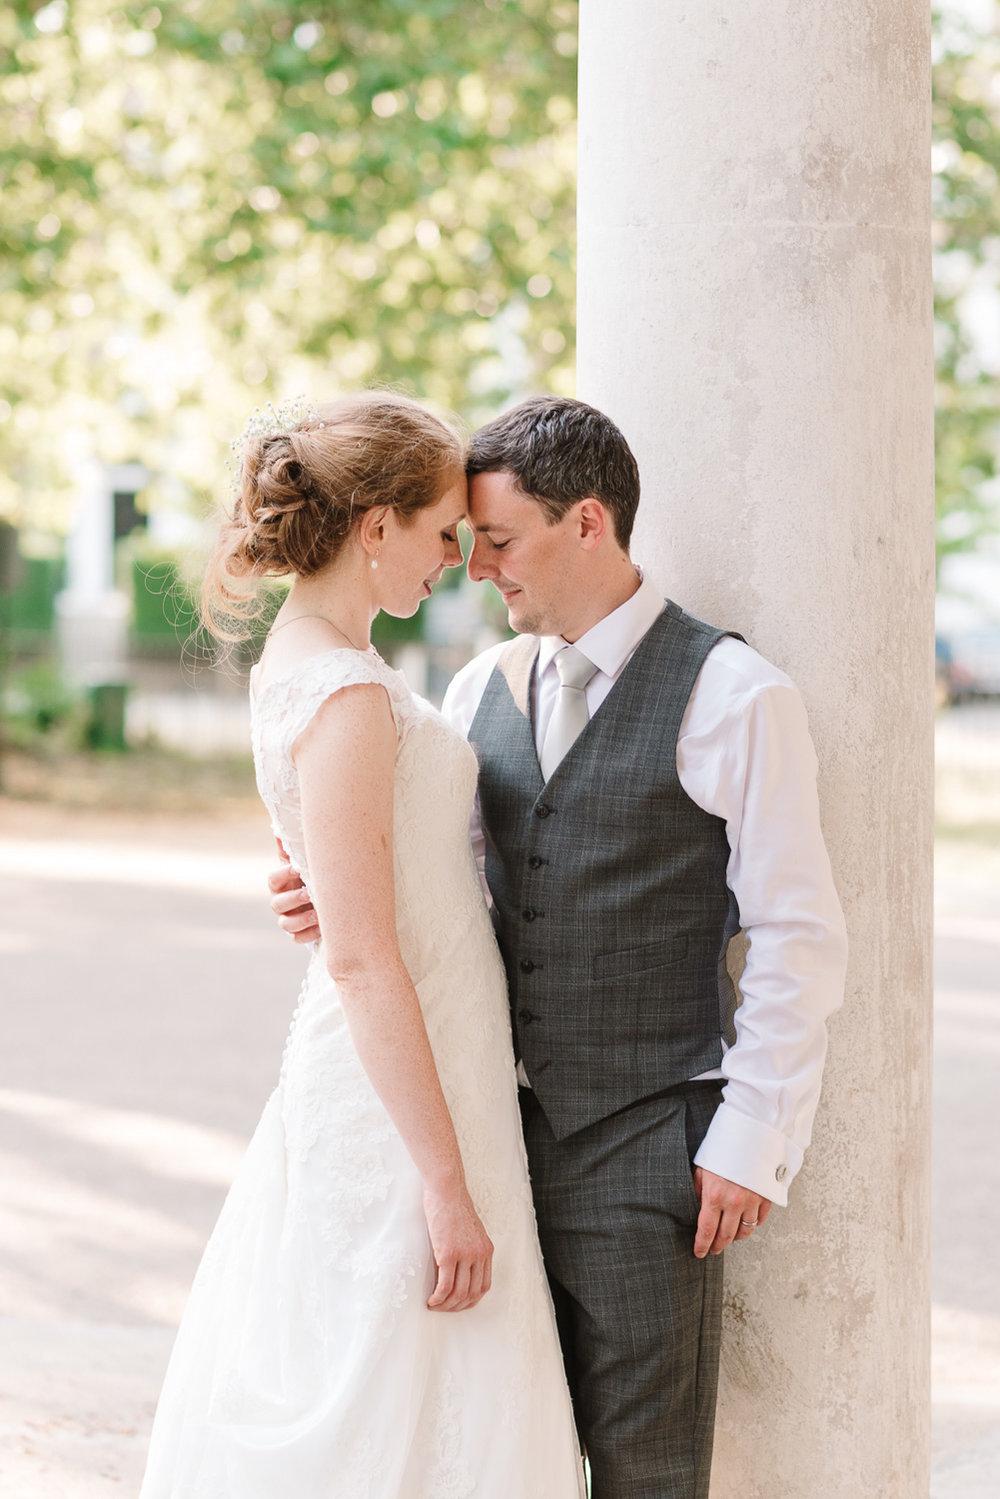 clapham-london-wedding-photographer-44.jpg